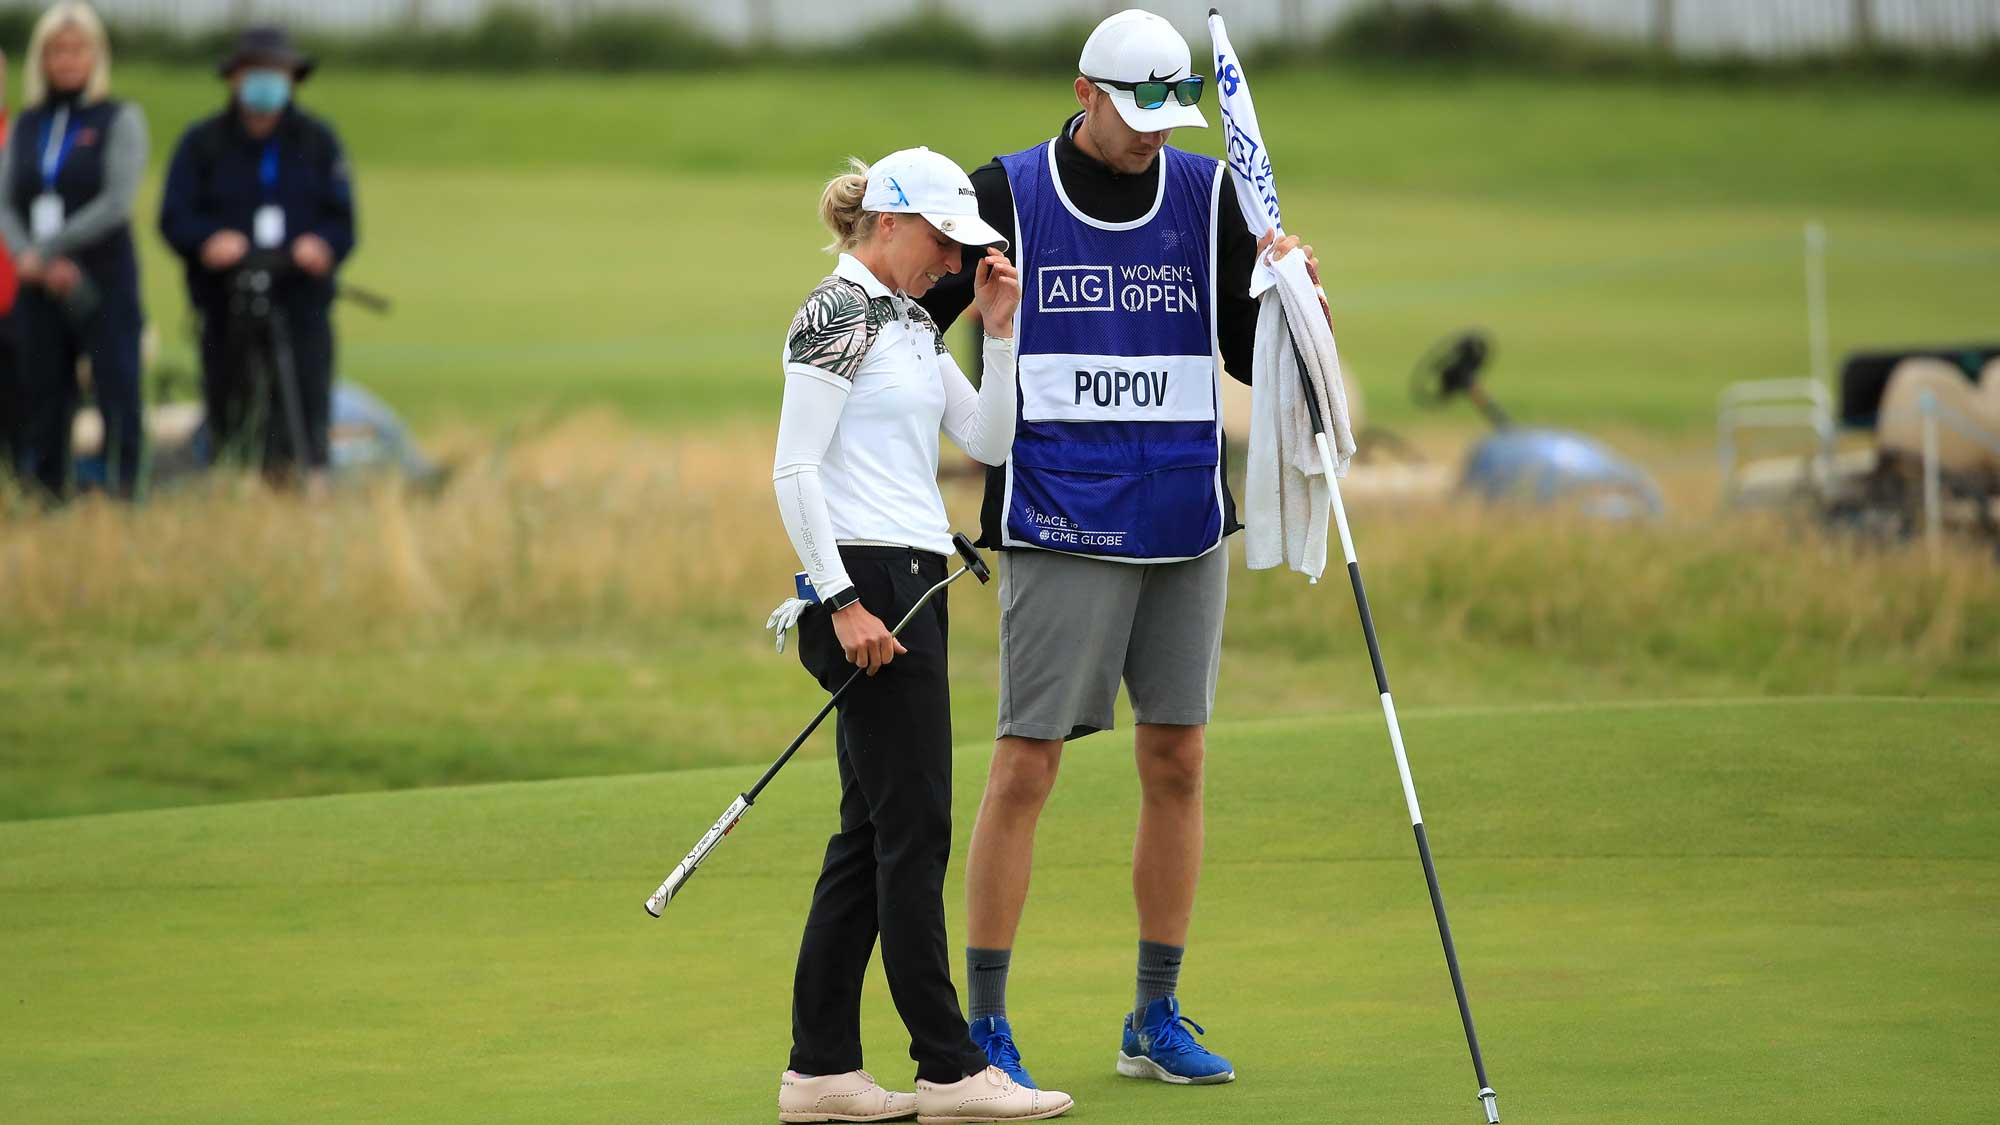 Popov Reveals Battle | LPGA | Ladies Professional Golf Association